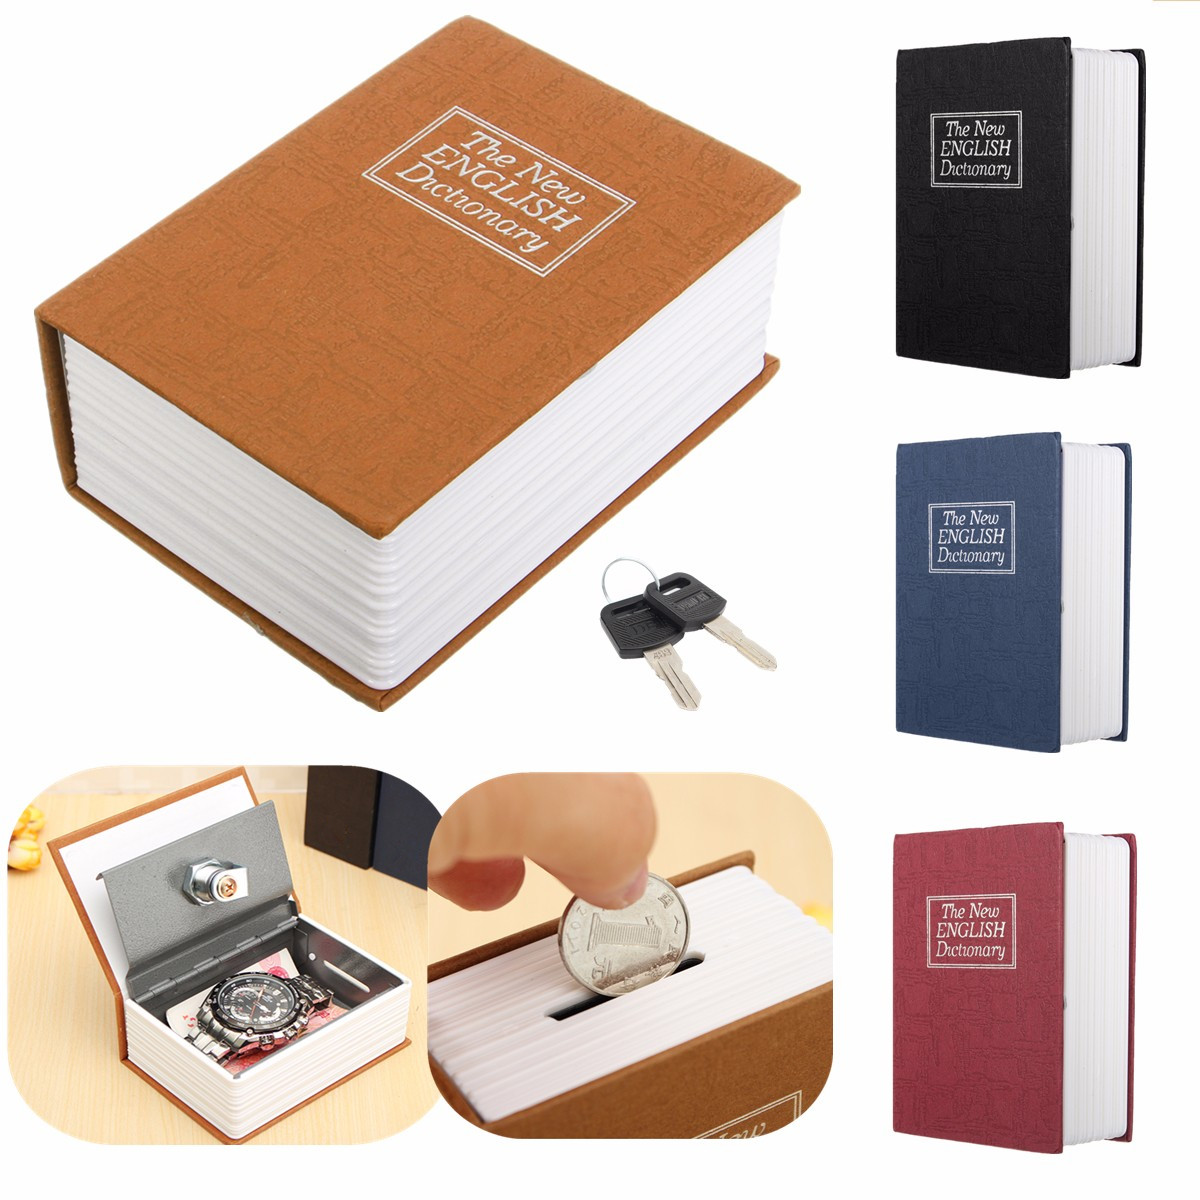 4 Color Home Storage Safe Box Dictionary Book Bank Money Cash Jewellery Hidden Secret Security Locker With Key Lock 1